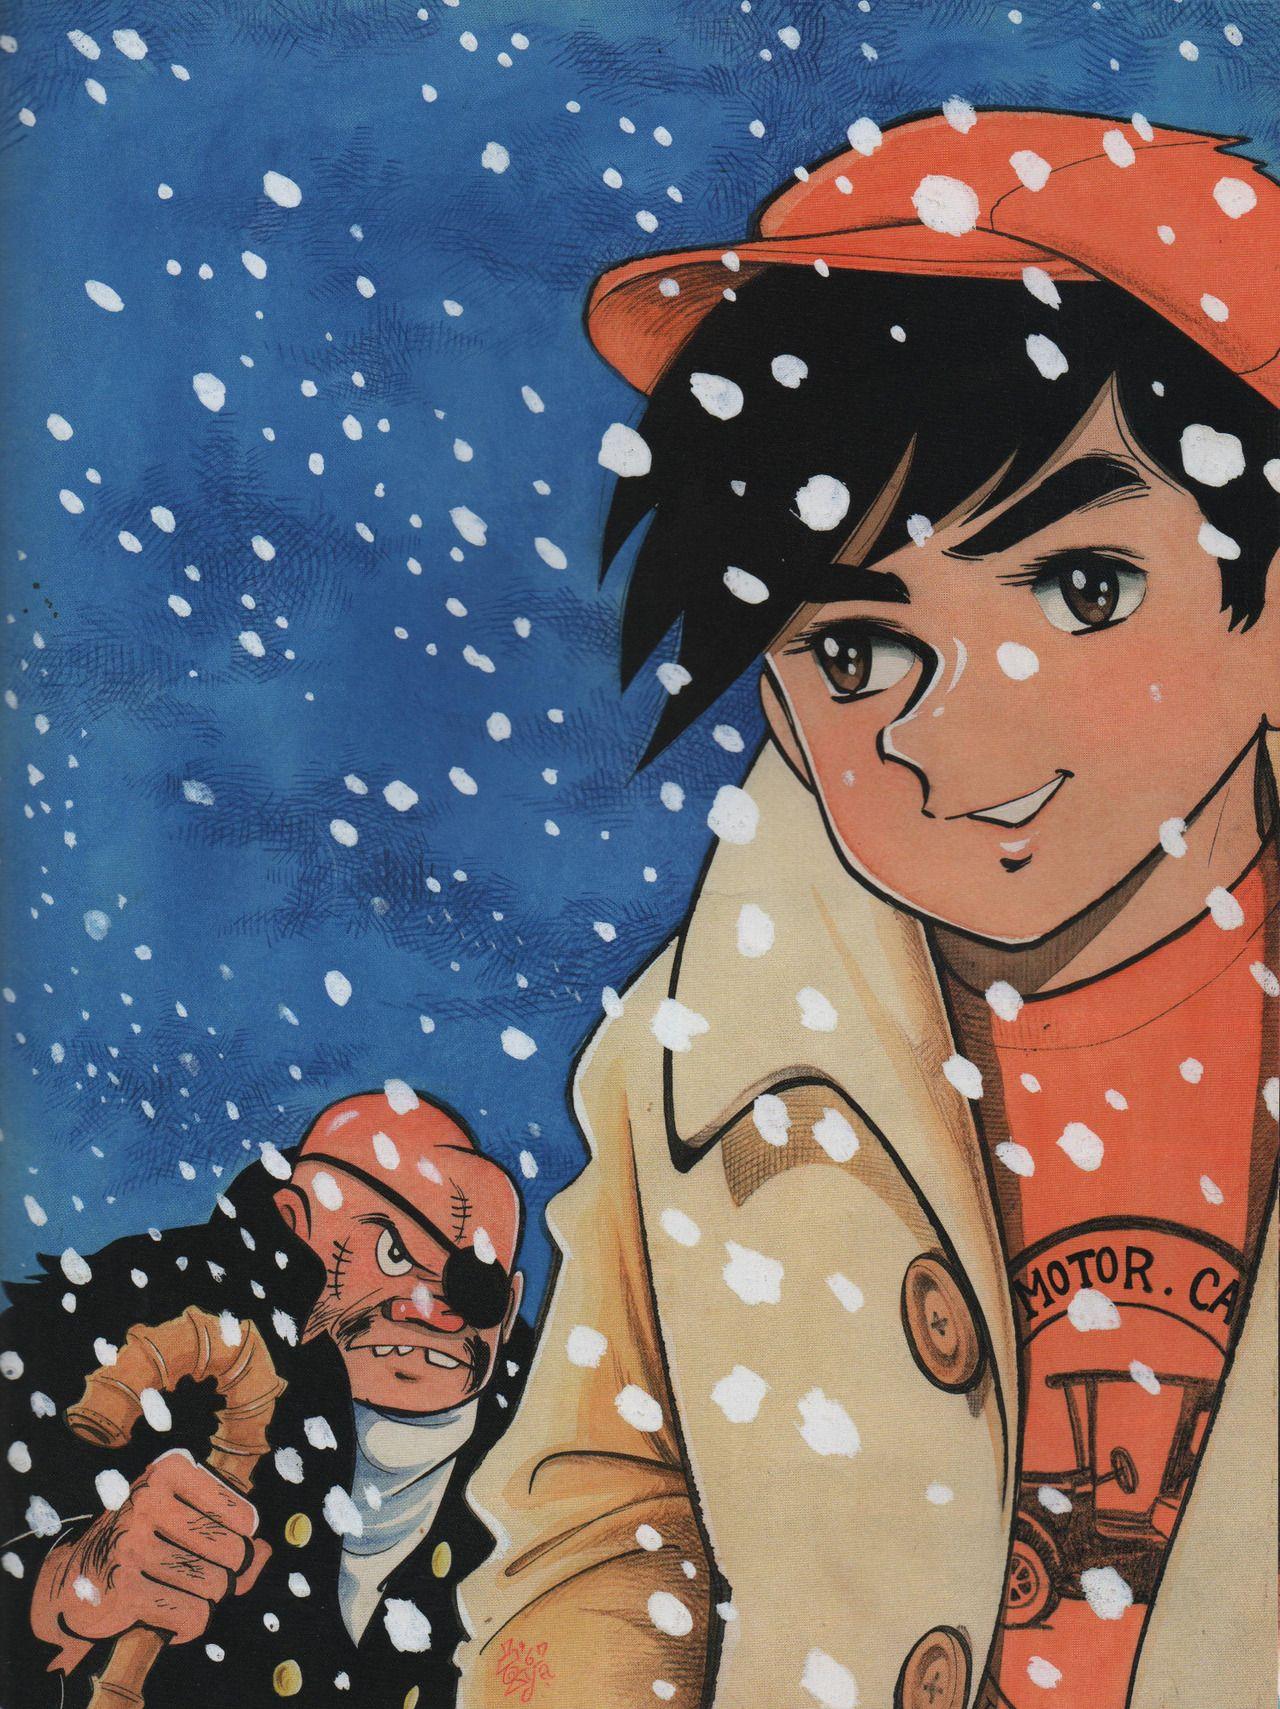 Pin by Raghda on Ashita no Joe in 2020 Anime, Marvel